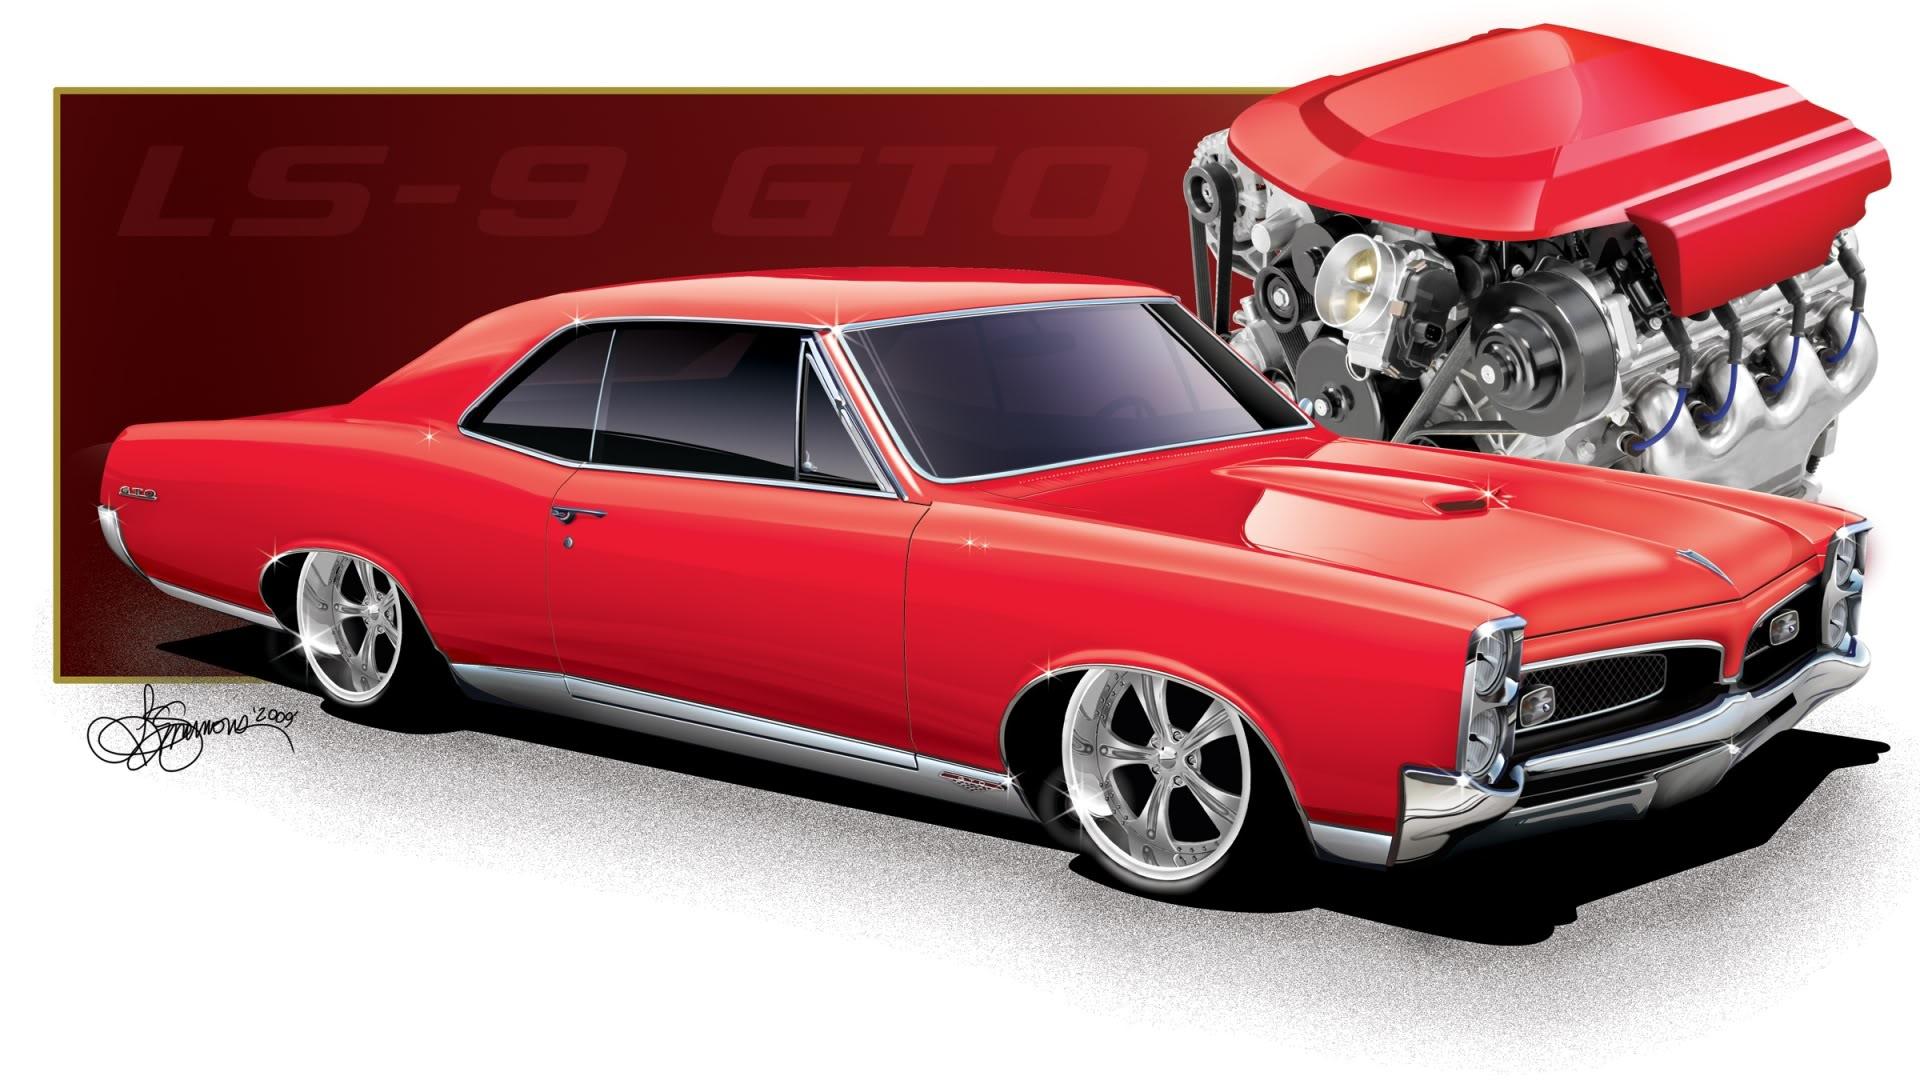 1967 Red LS9 Pontiac GTO wallpaper 1920x1080 36938 WallpaperUP 1920x1080